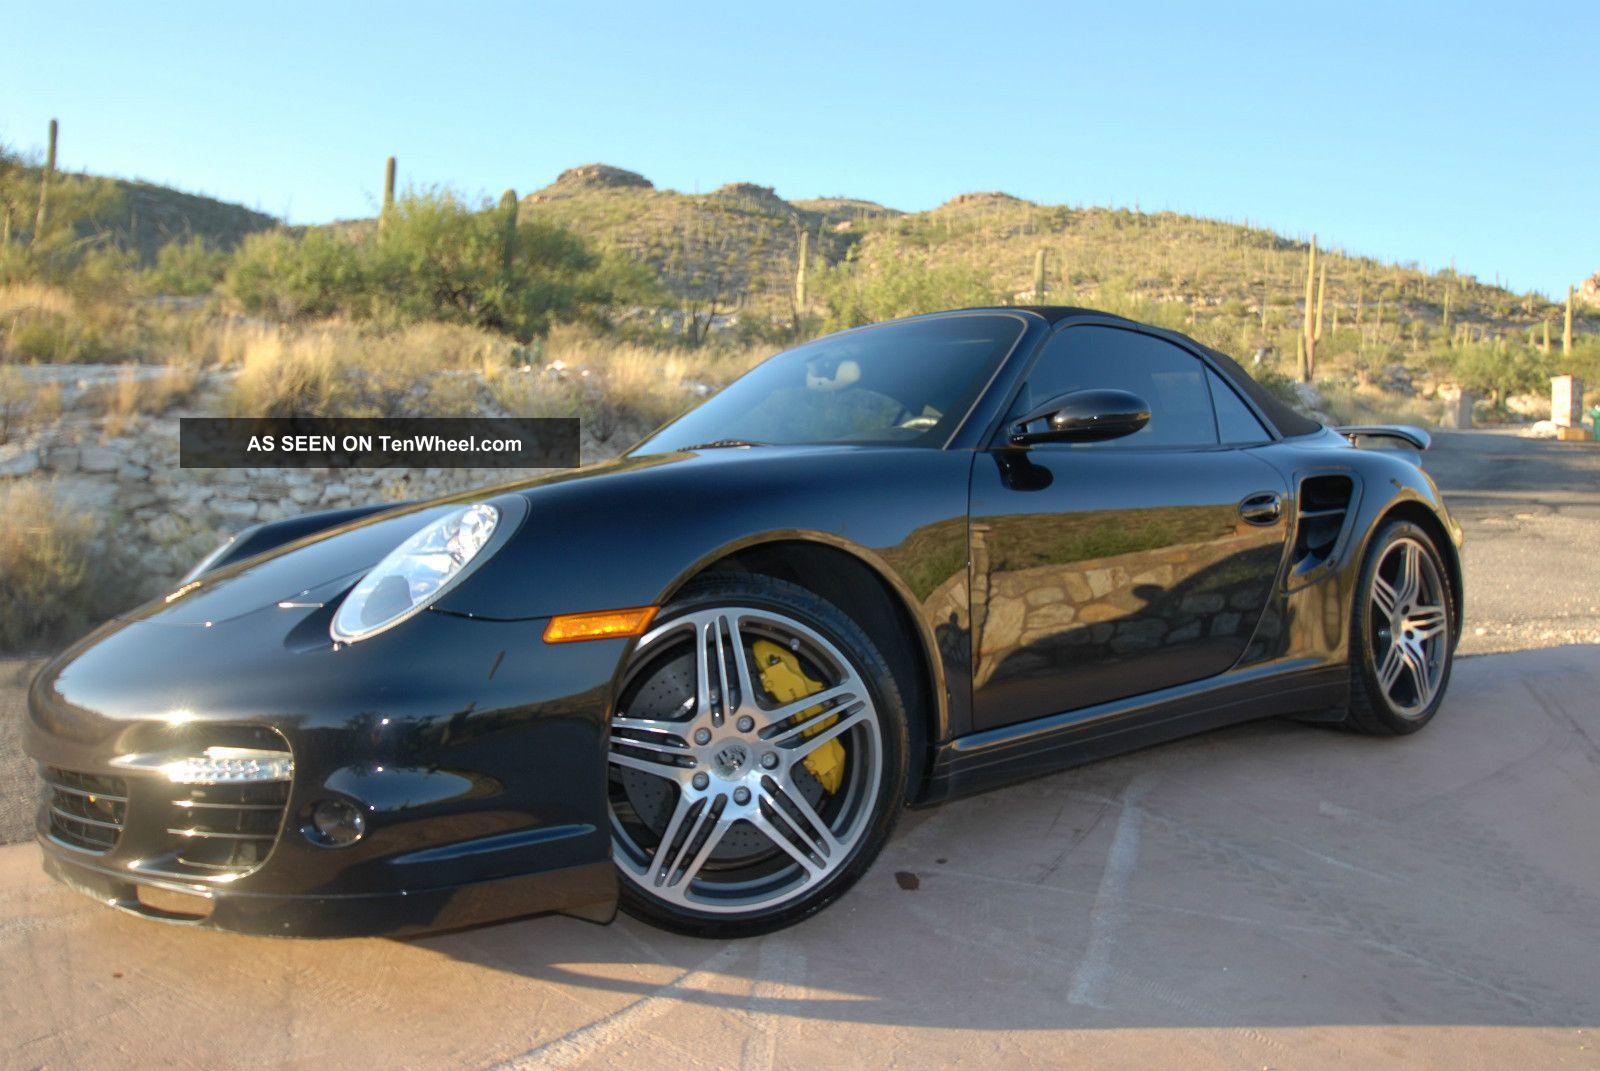 2008 Porsche Turbo Cabriolet 911 photo